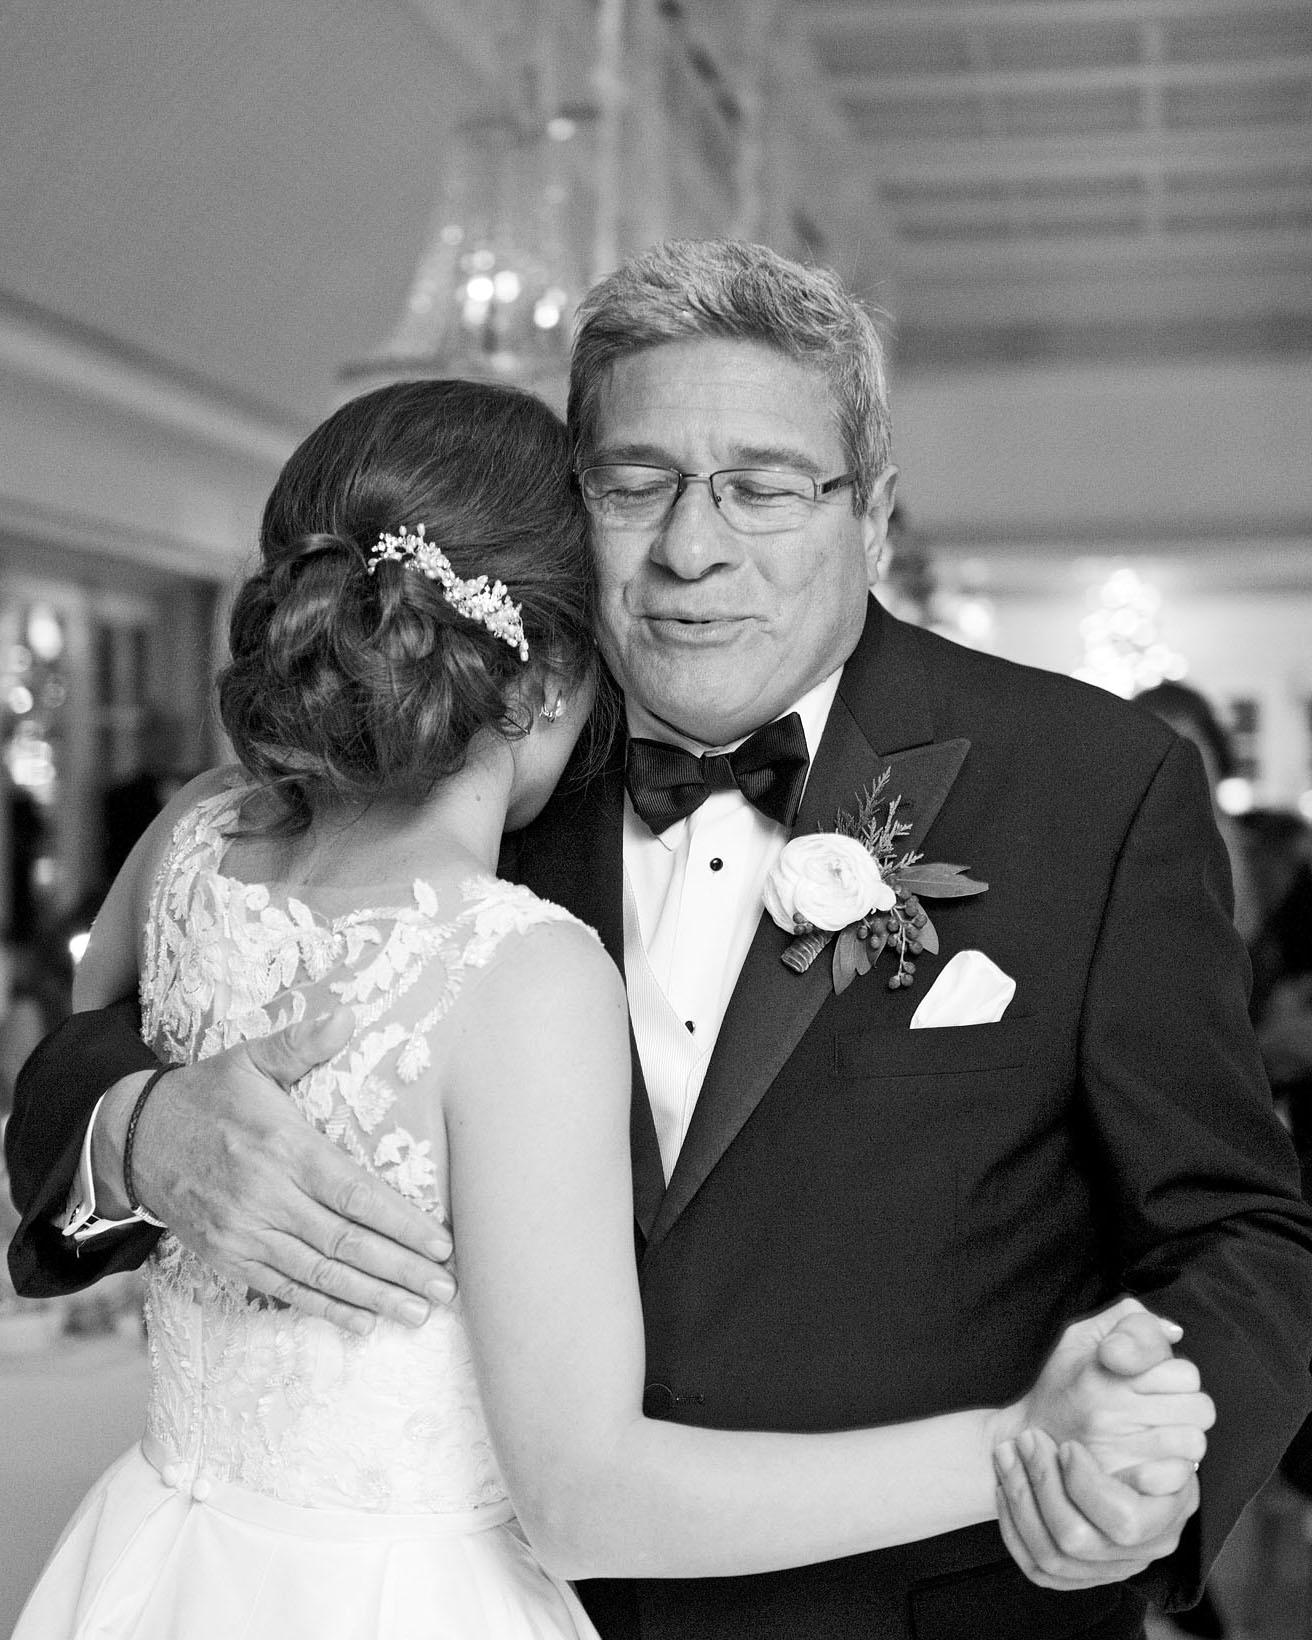 celina rob wedding virginia father dance